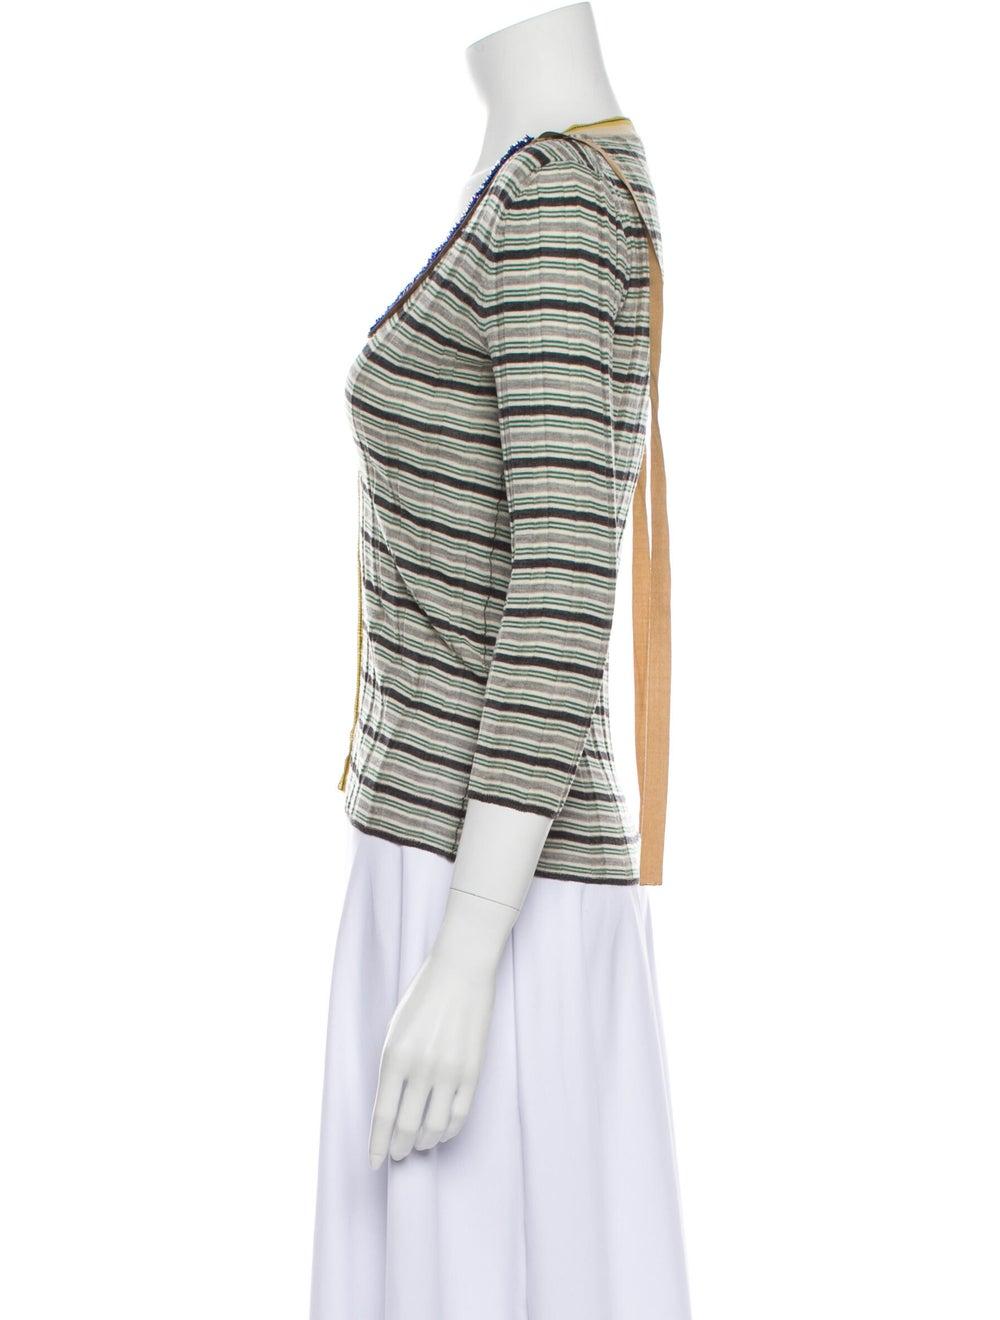 Prada Wool Striped Sweater Wool - image 2